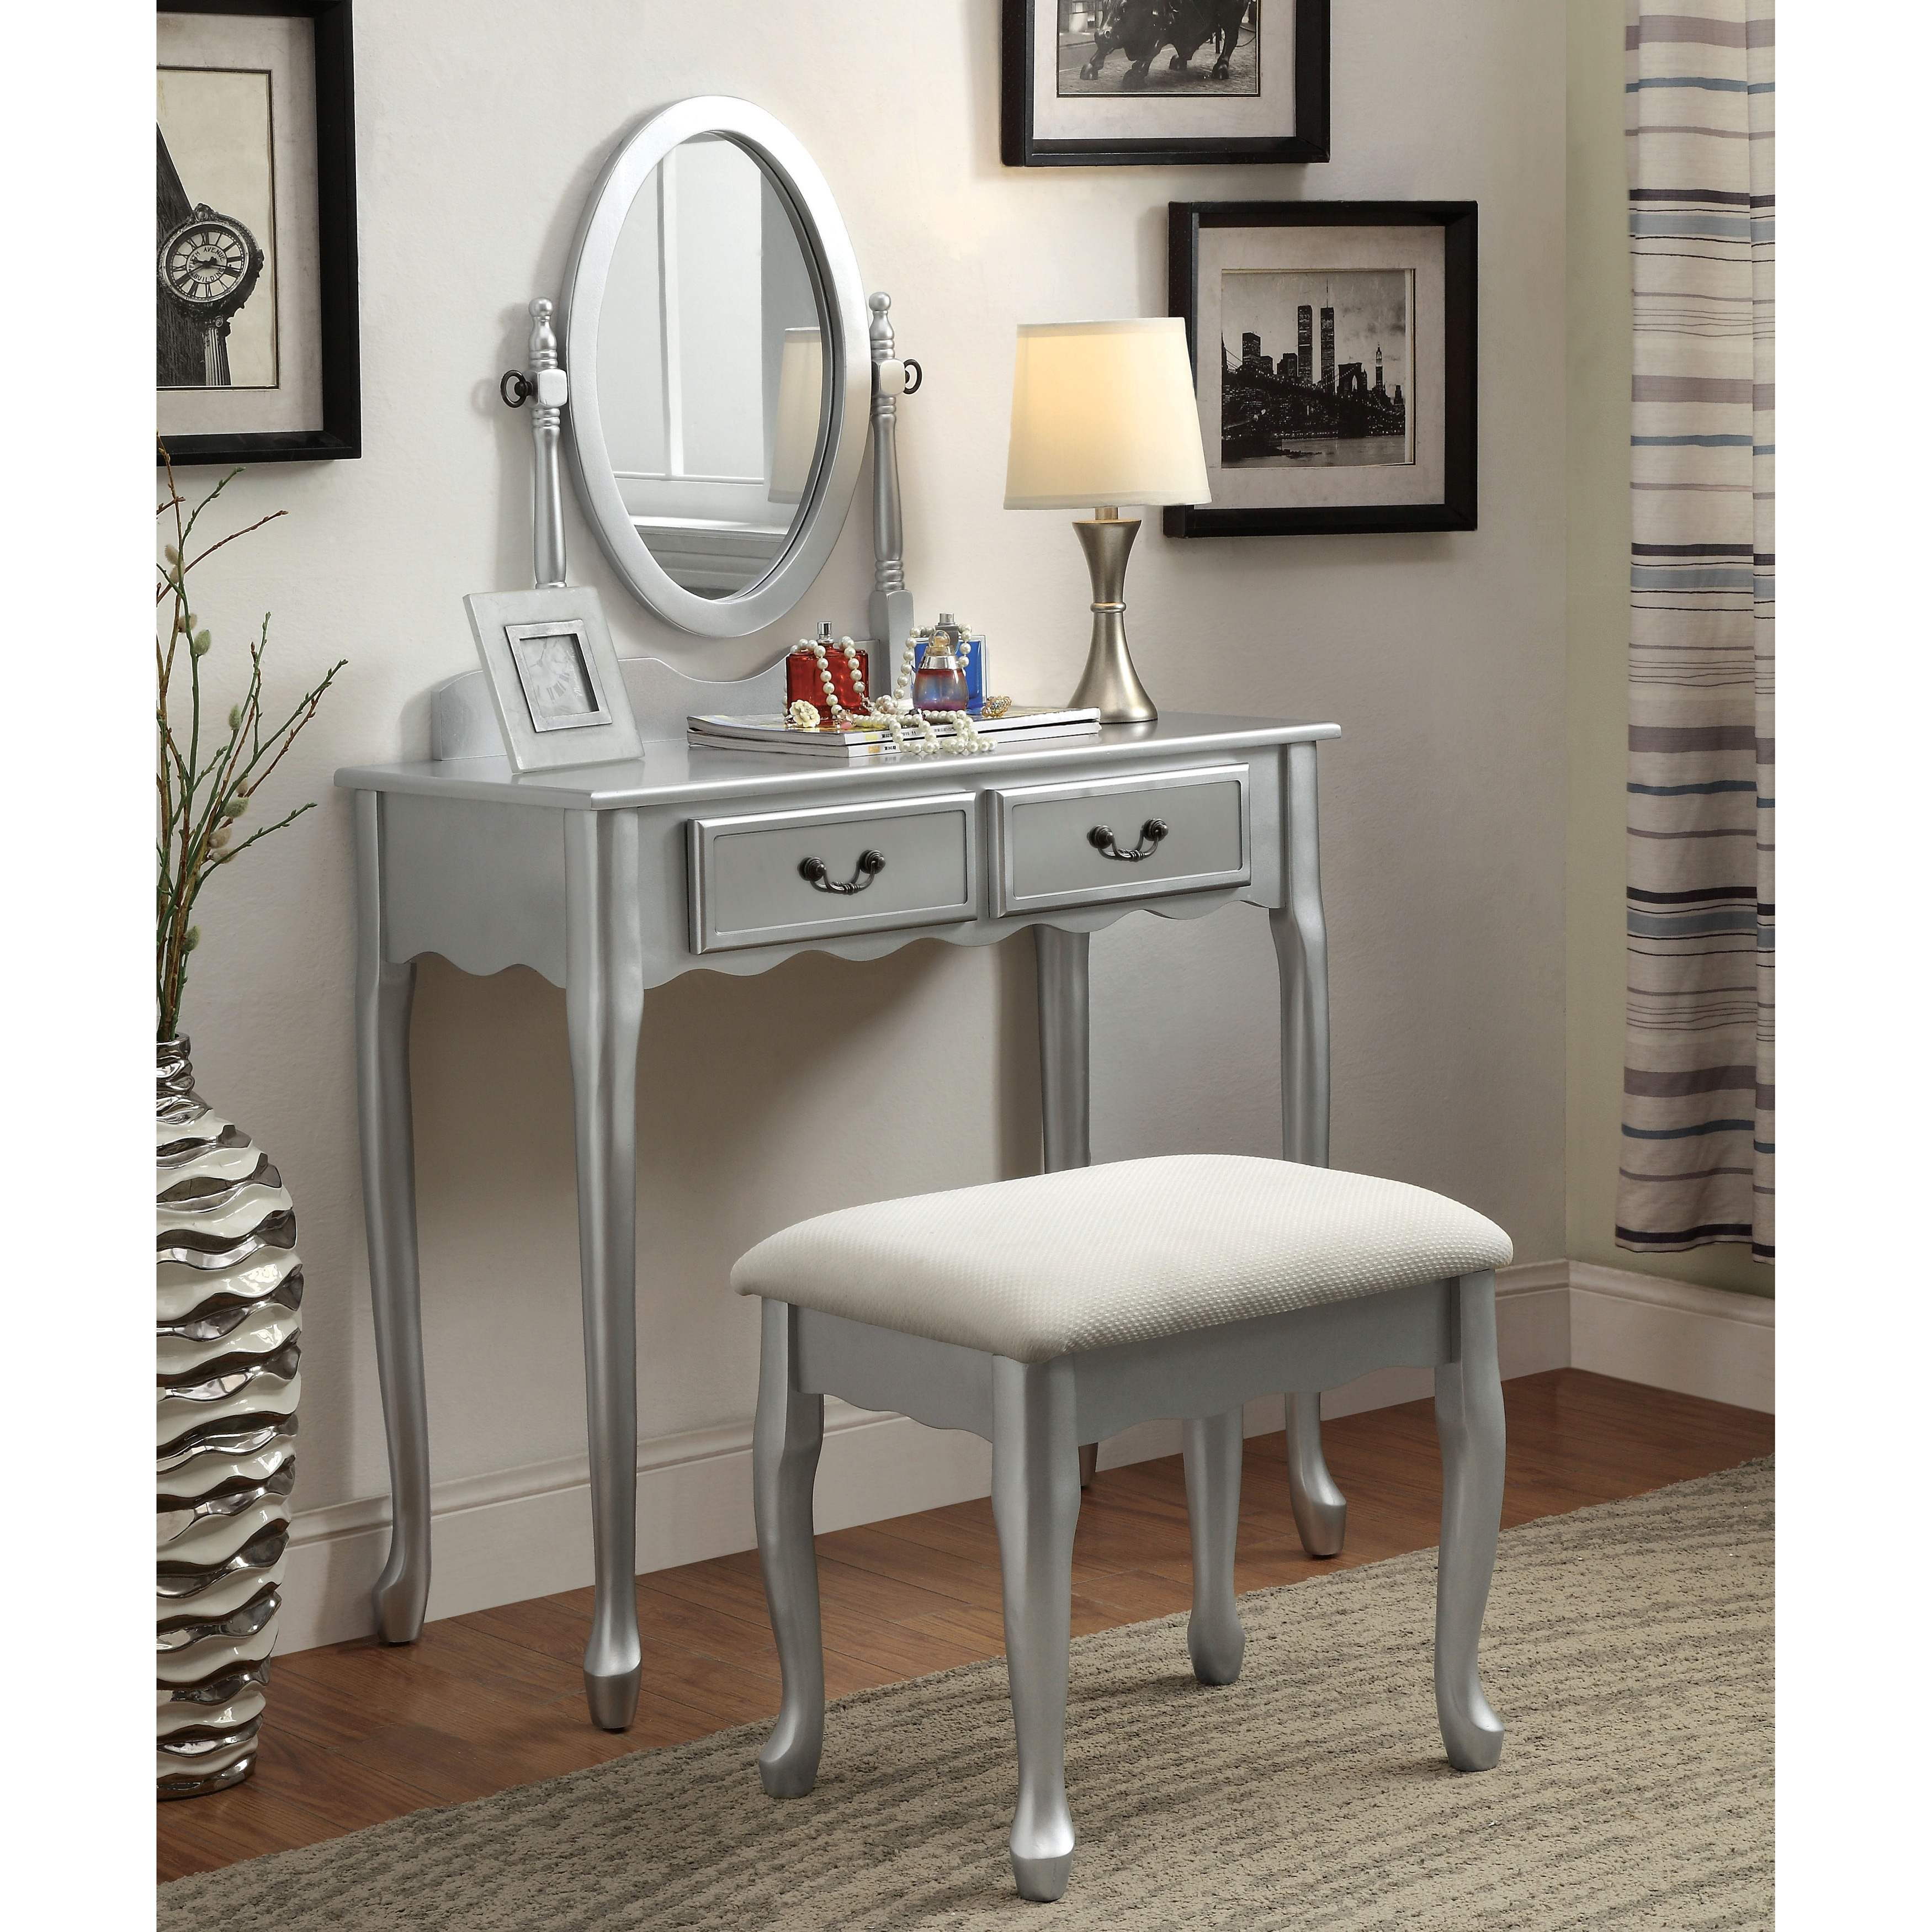 Etonnant Furniture Of America Savanna 2 Piece Classic Vanity Table And Stool ...